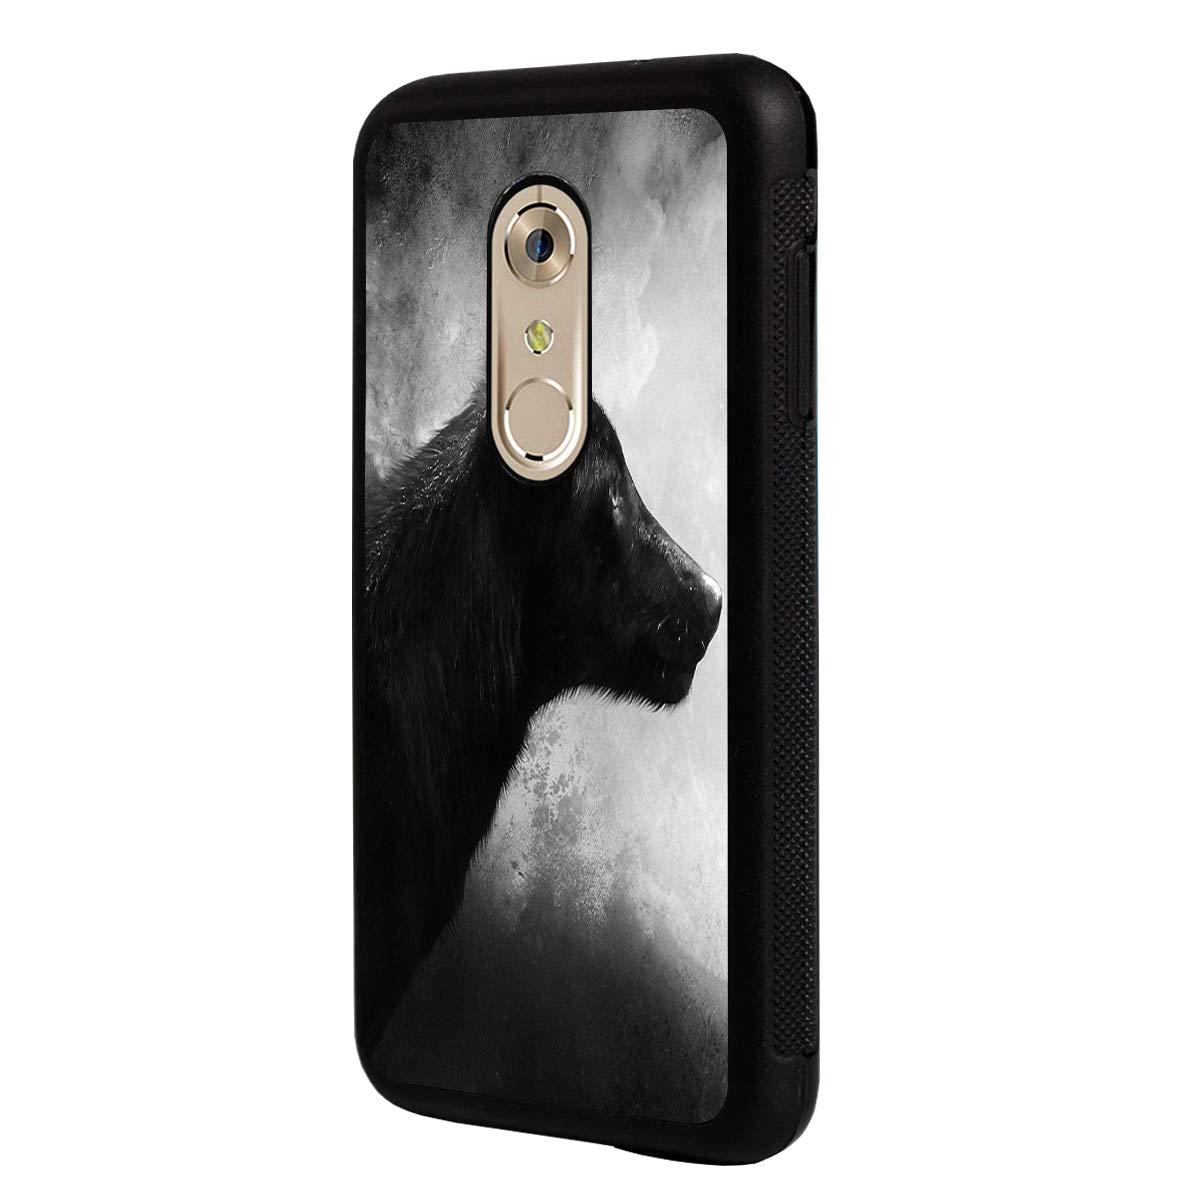 LG Q7 Case,LG Q7 Plus Case,BOSLIVE Black Wolf Background Design TPU Slim Anti-Scratch Protective Cover Case for LG Q7 /LG Q7 Plus